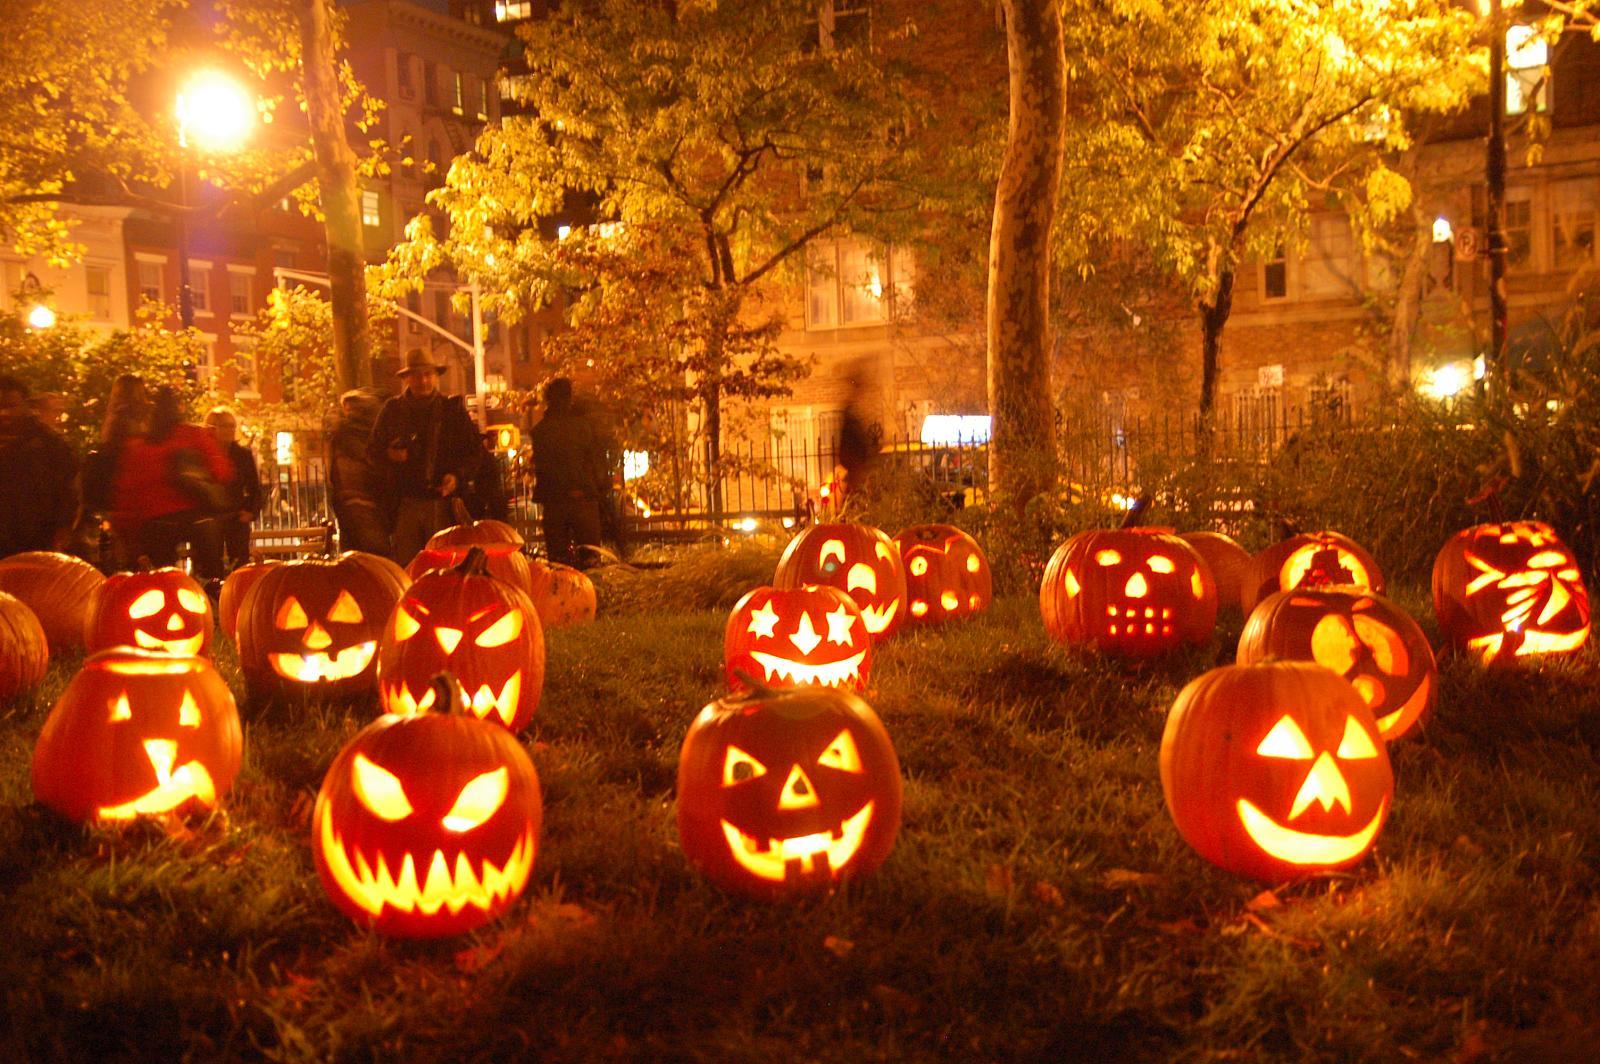 http://toutelaculture.com/wp-content/uploads/2013/10/halloween+picture.jpg